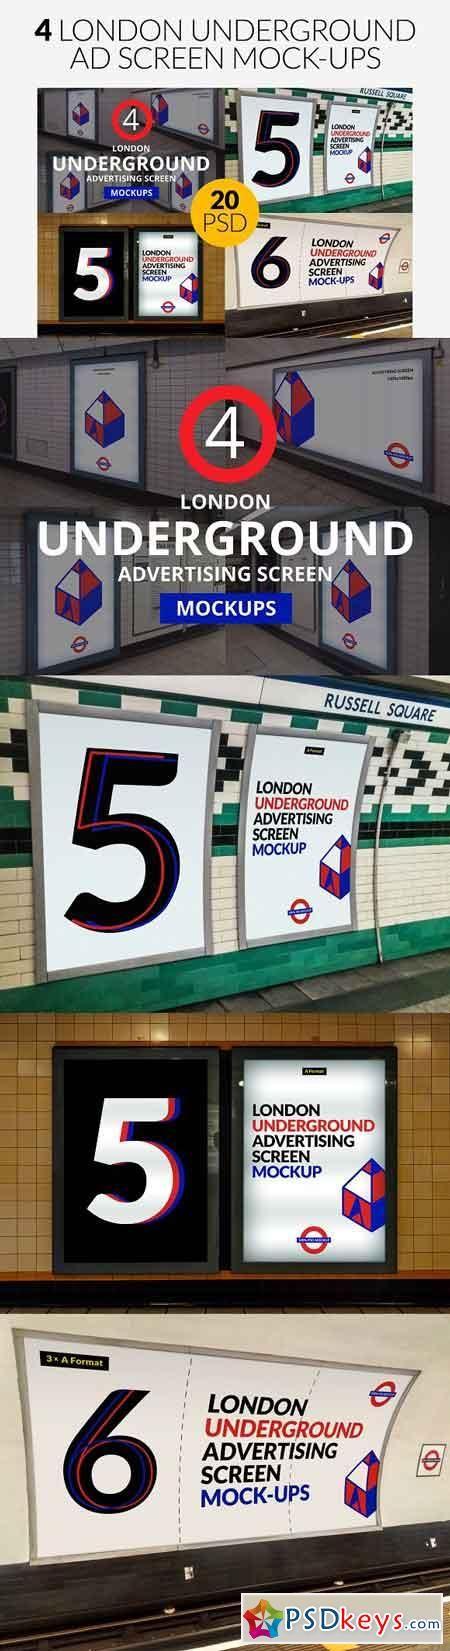 4 London Underground Mock-Ups Bundle 2532376 | psd keys